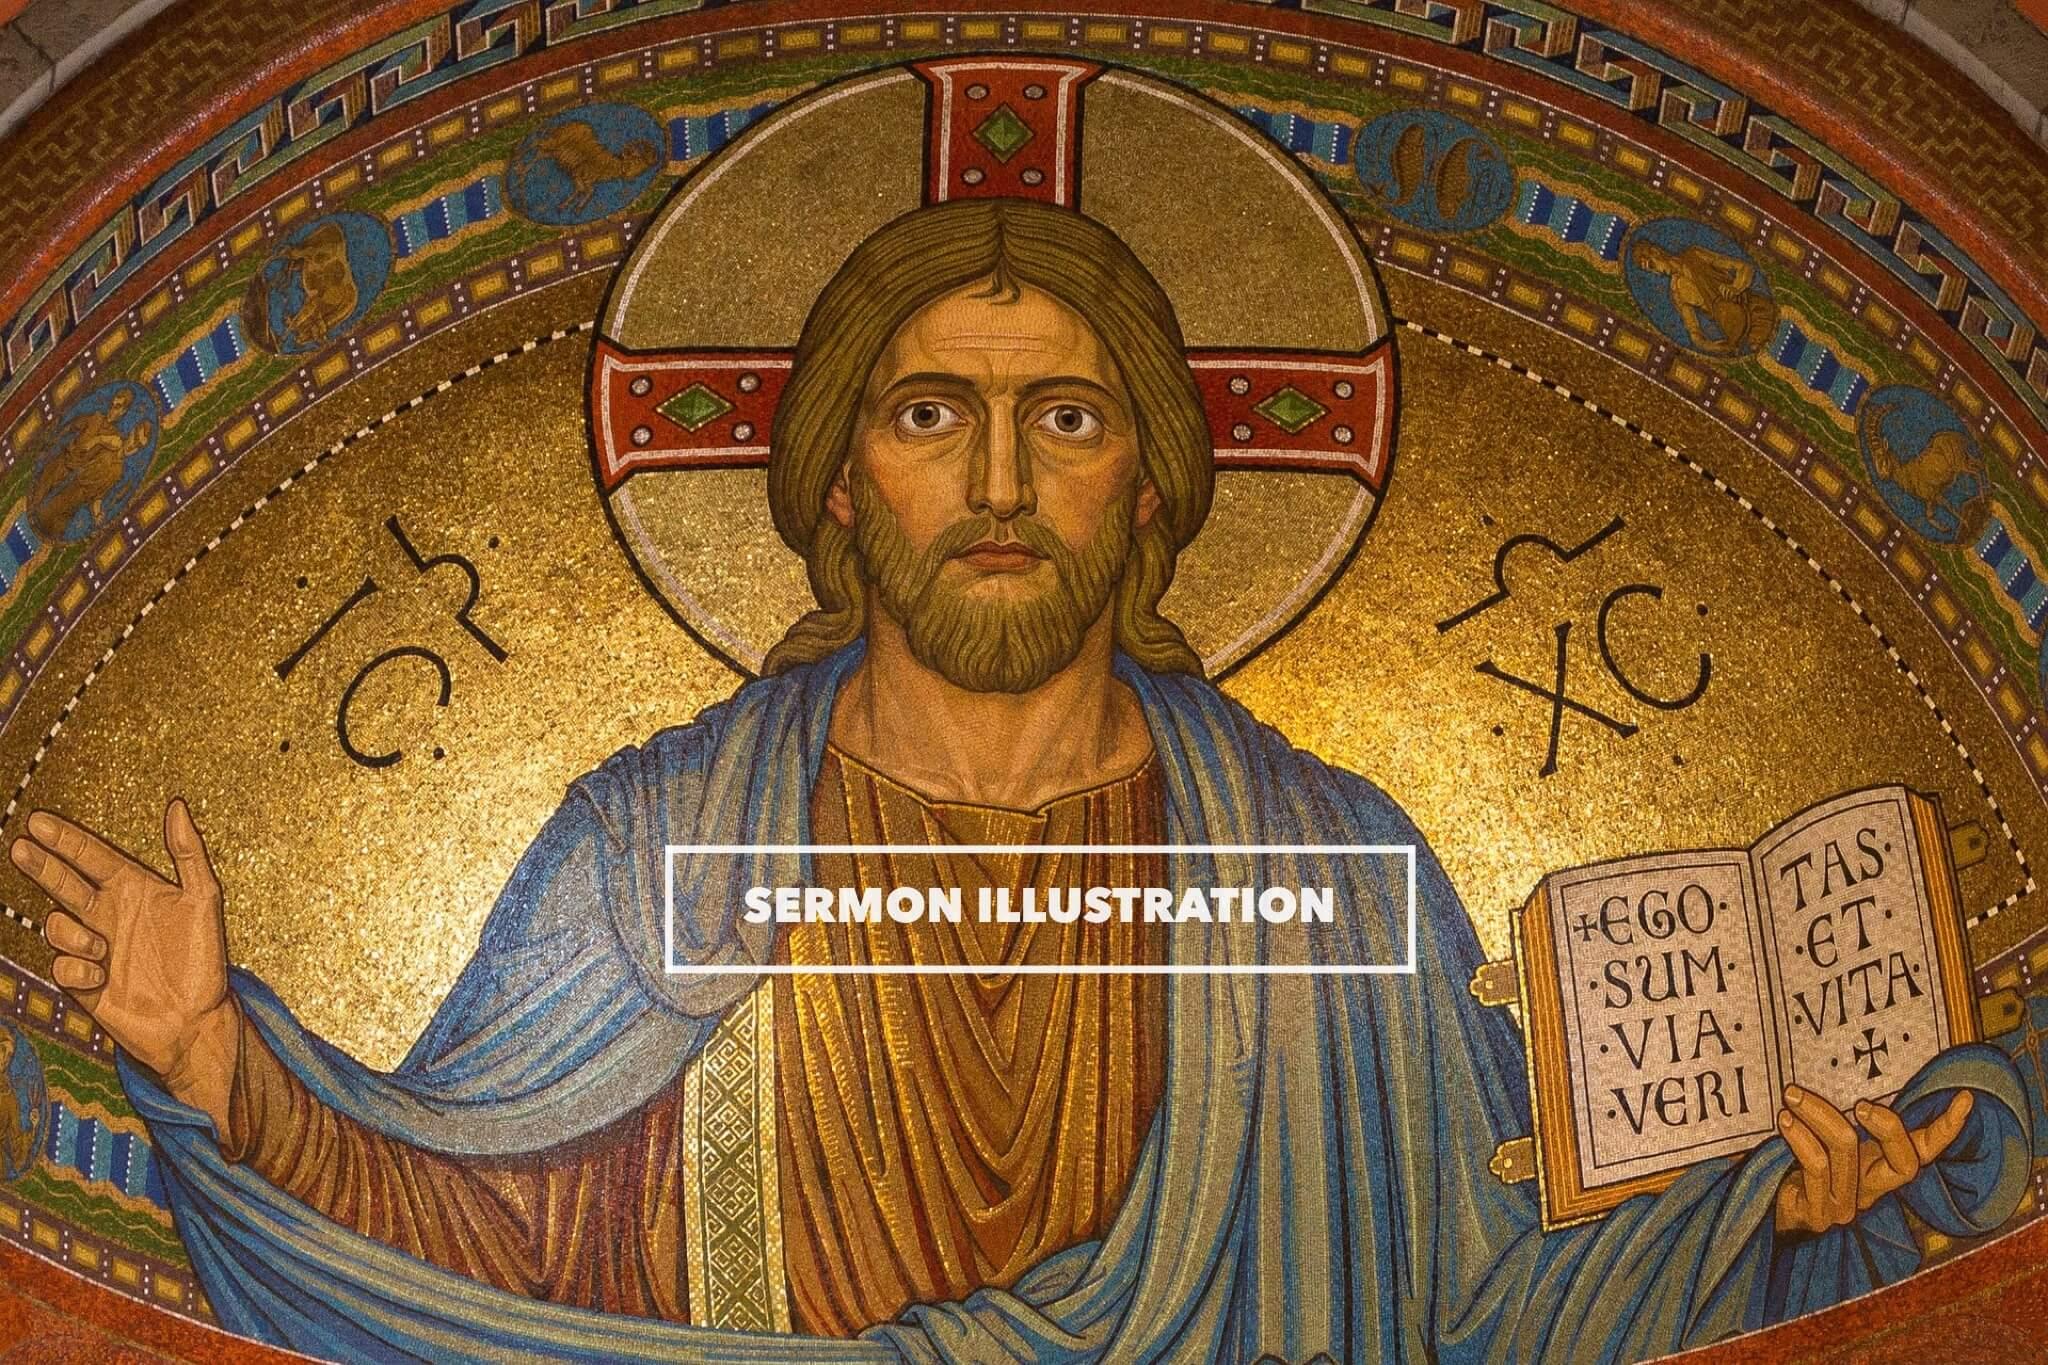 renewing your mind sermon illustration